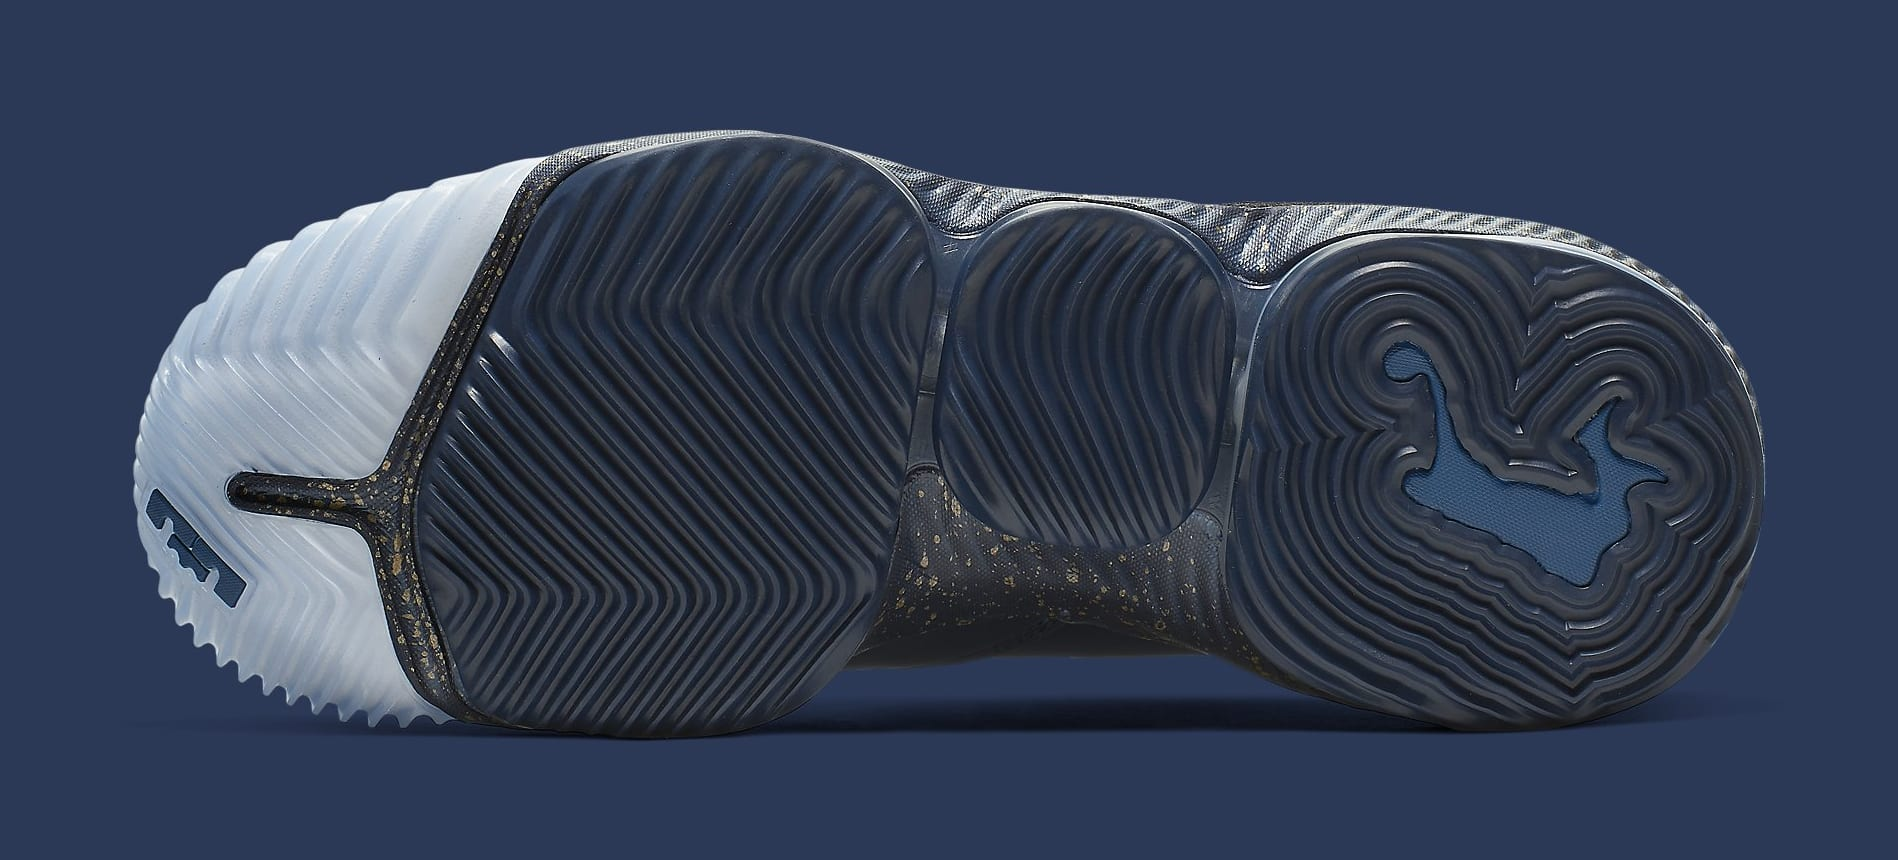 titan-nike-lebron-16-low-agimat-cj9919-400-sole